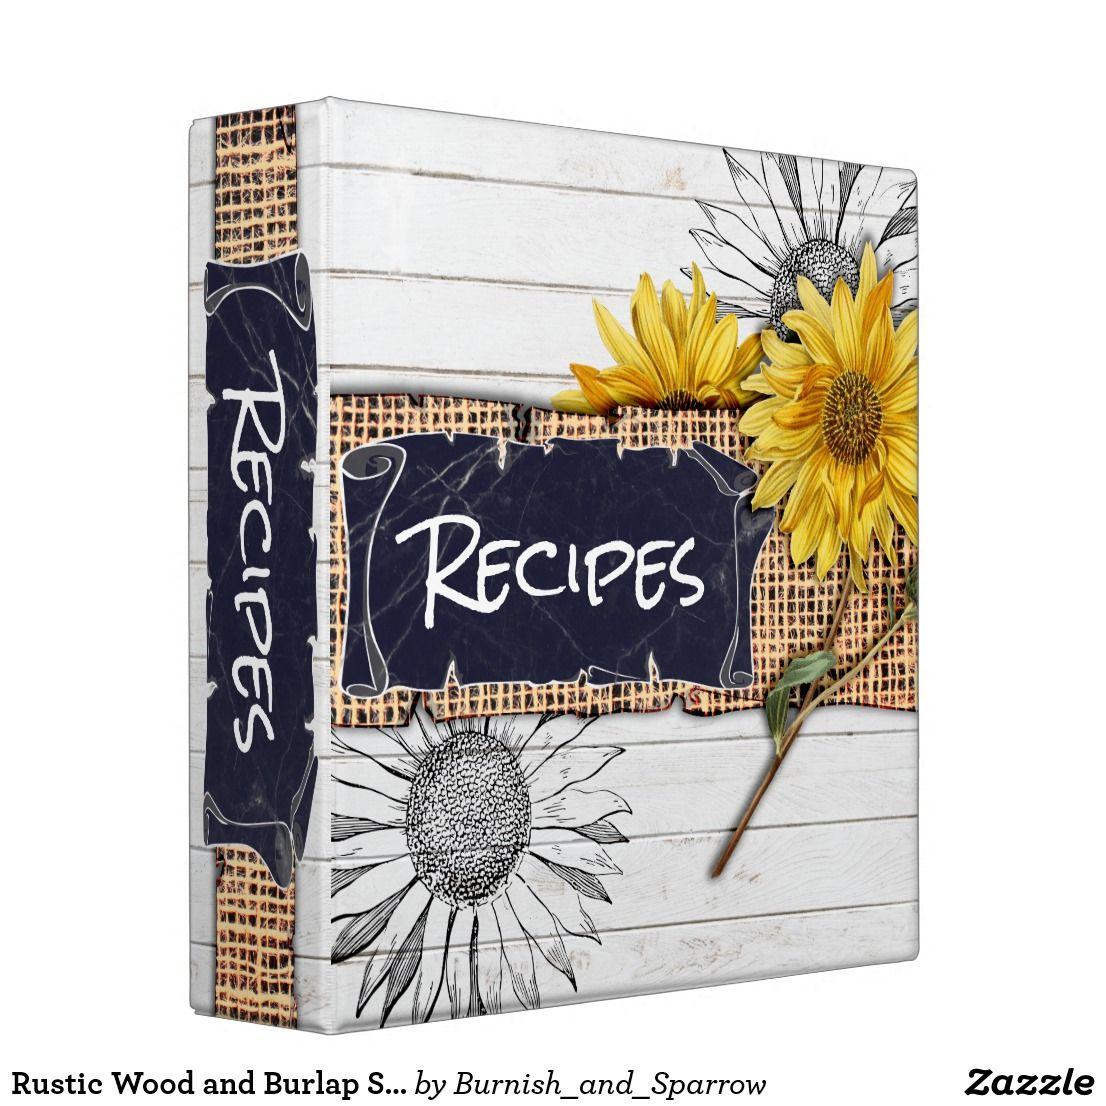 Rustic Wood And Burlap Sunflower Recipe 3 Ring Binder